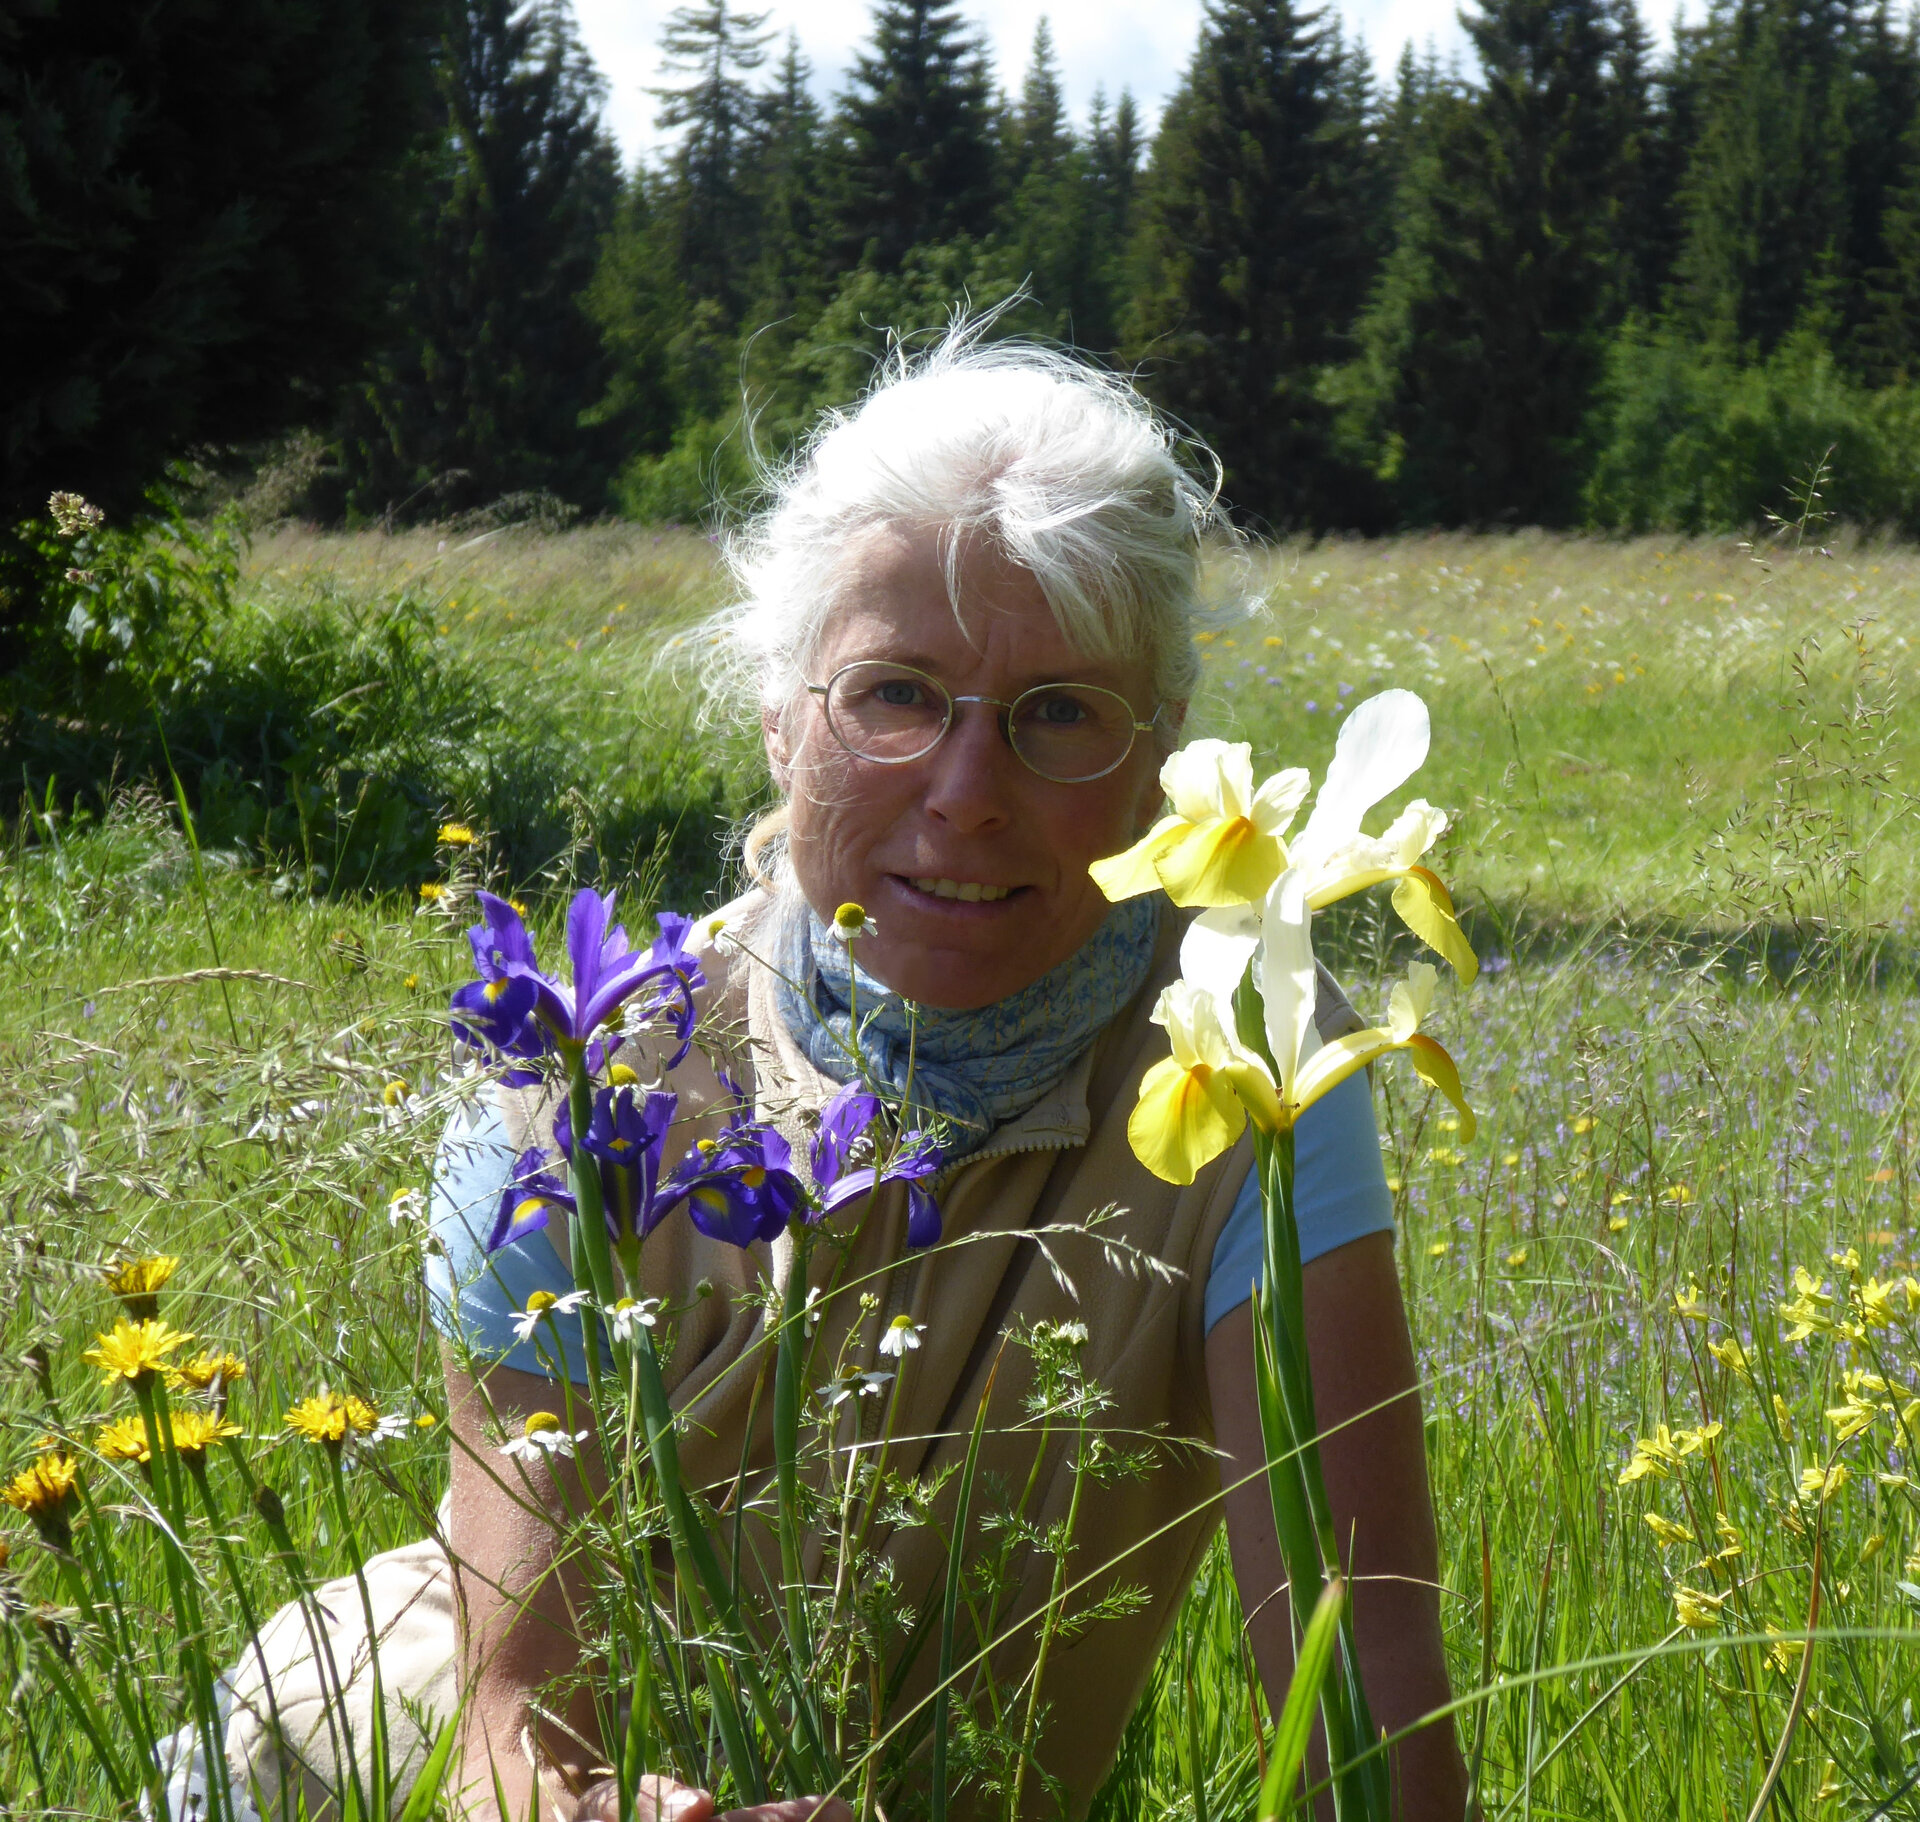 Iris Mende